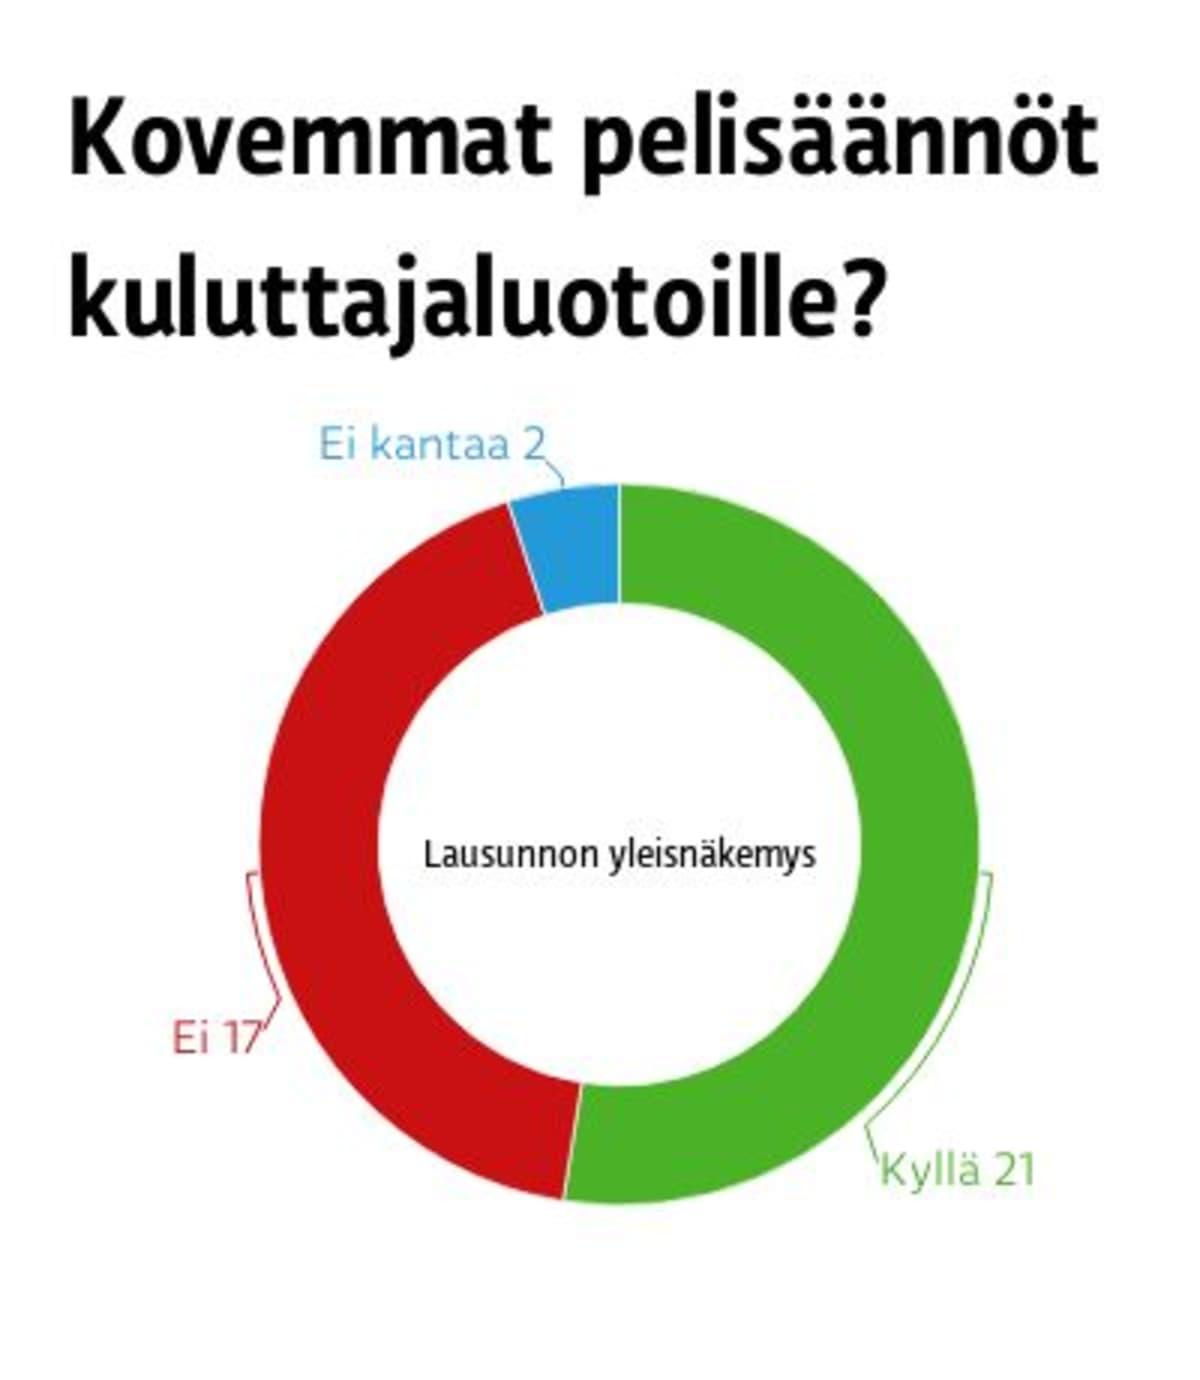 Antti Parviala / Yle